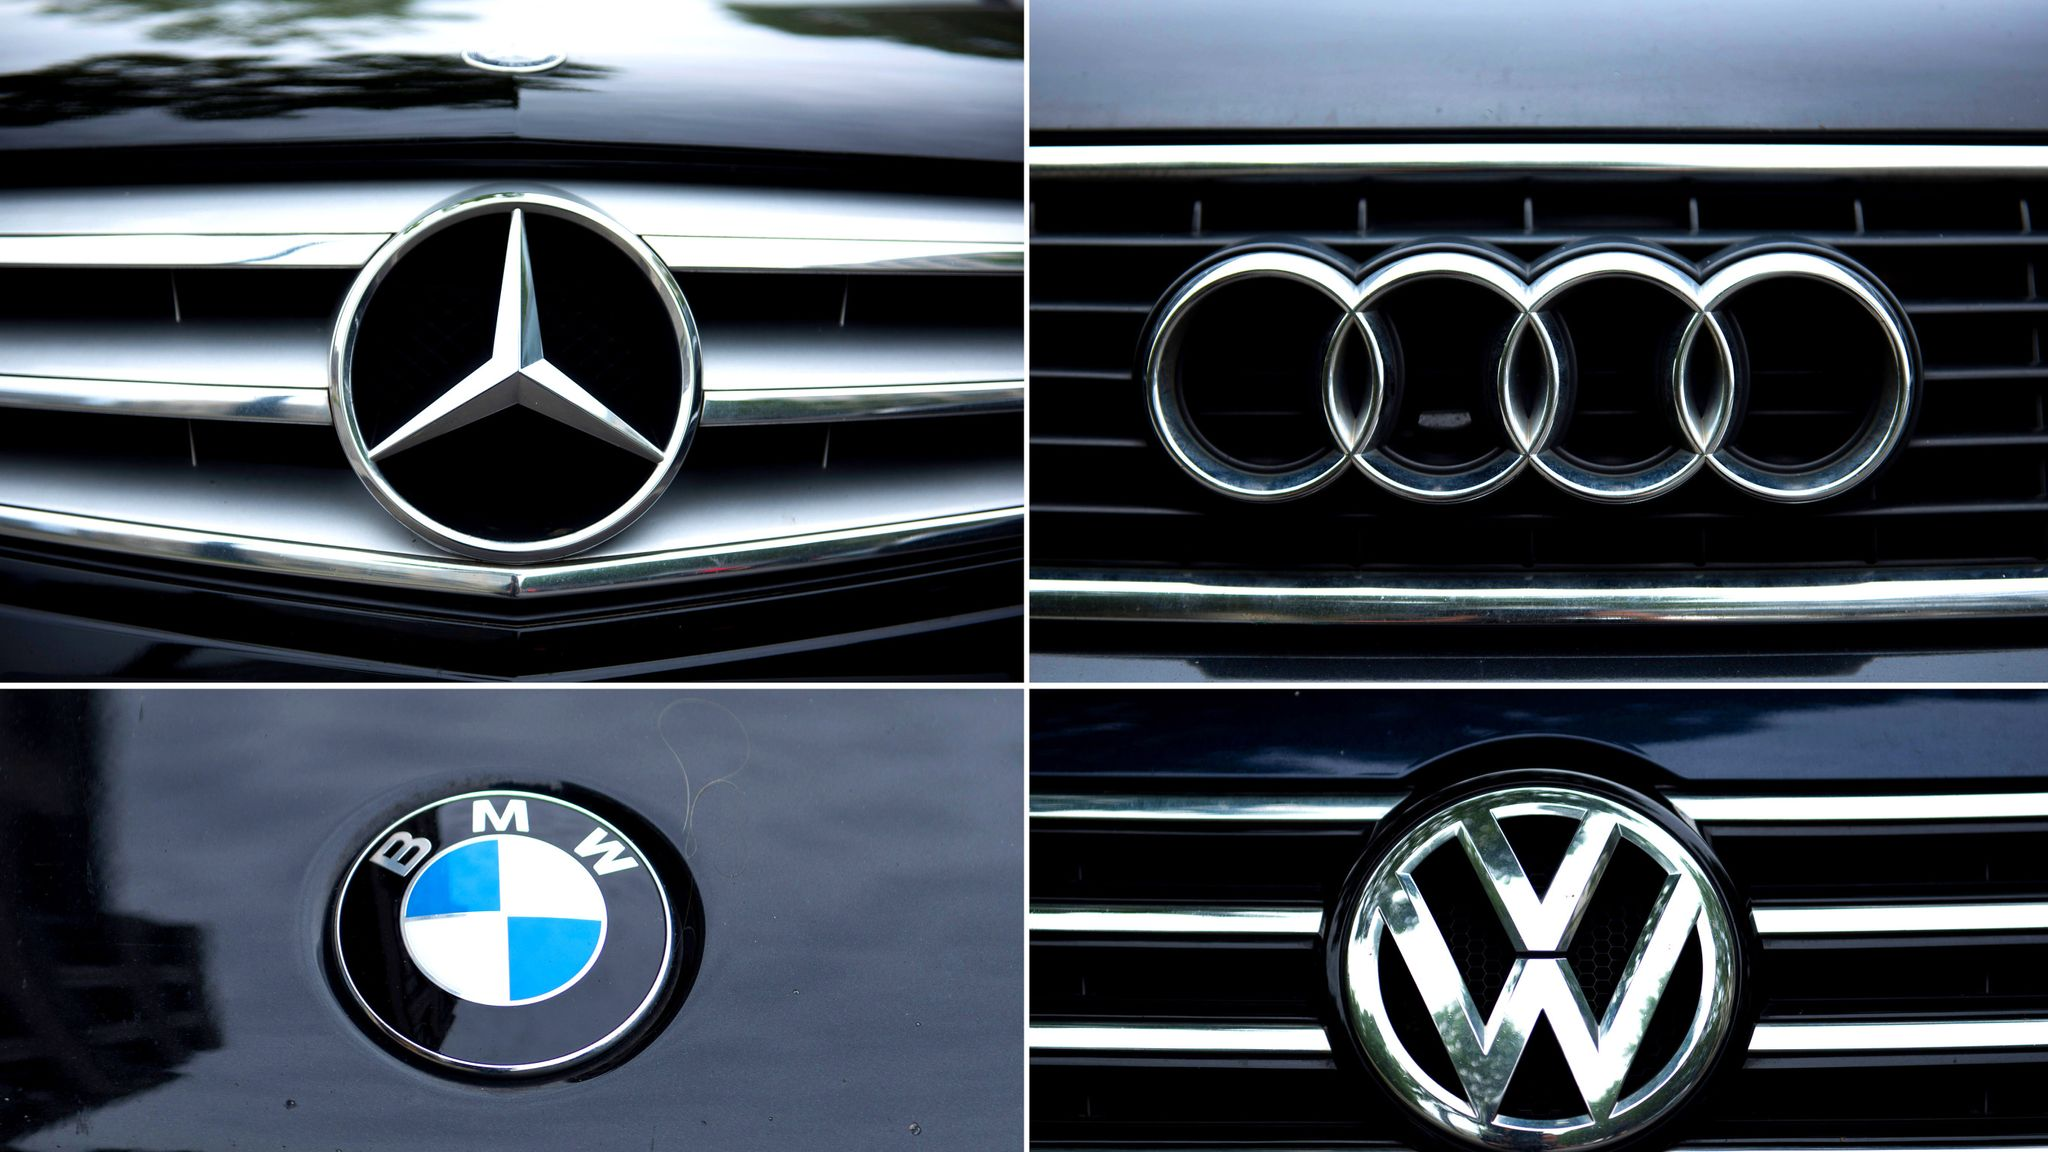 Kelebihan Kekurangan Audi Bmw Mercedes Harga